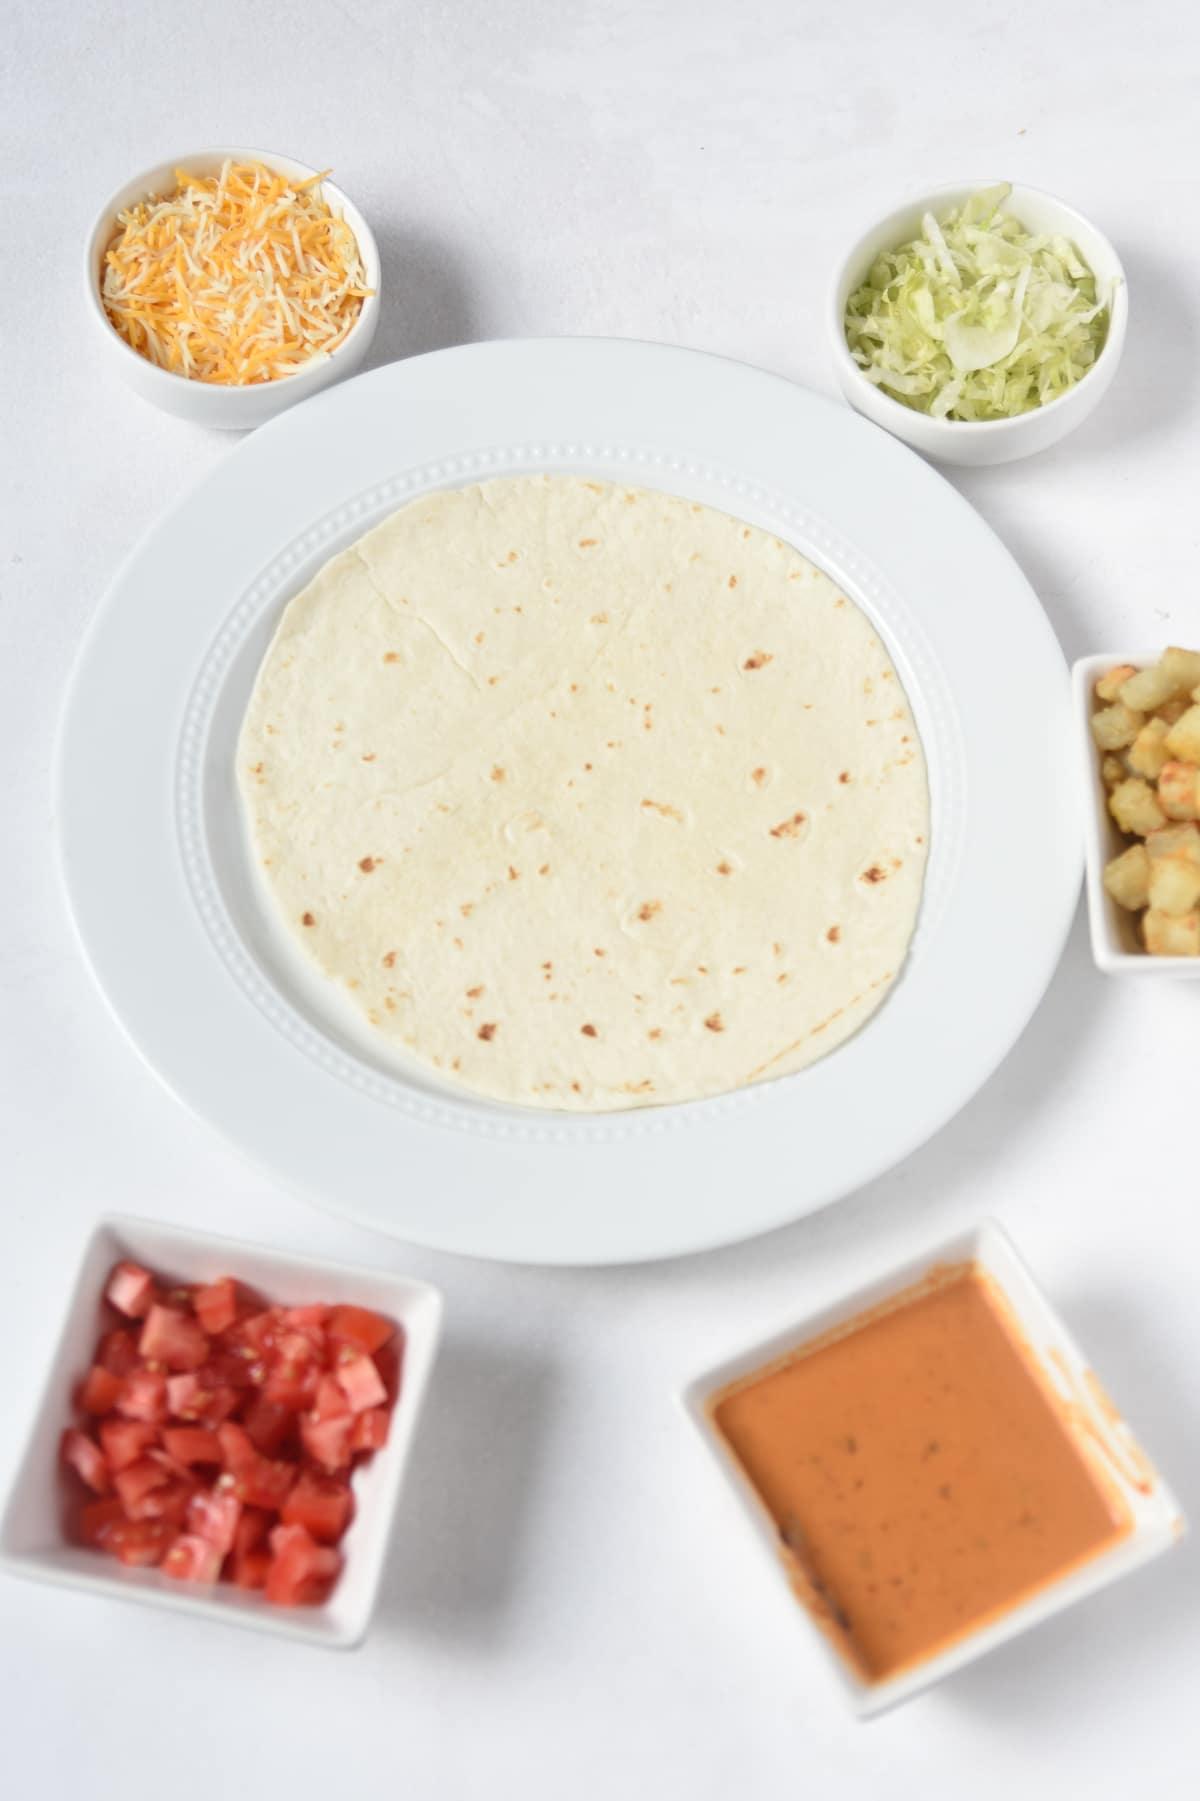 flour tortilla with ingredients